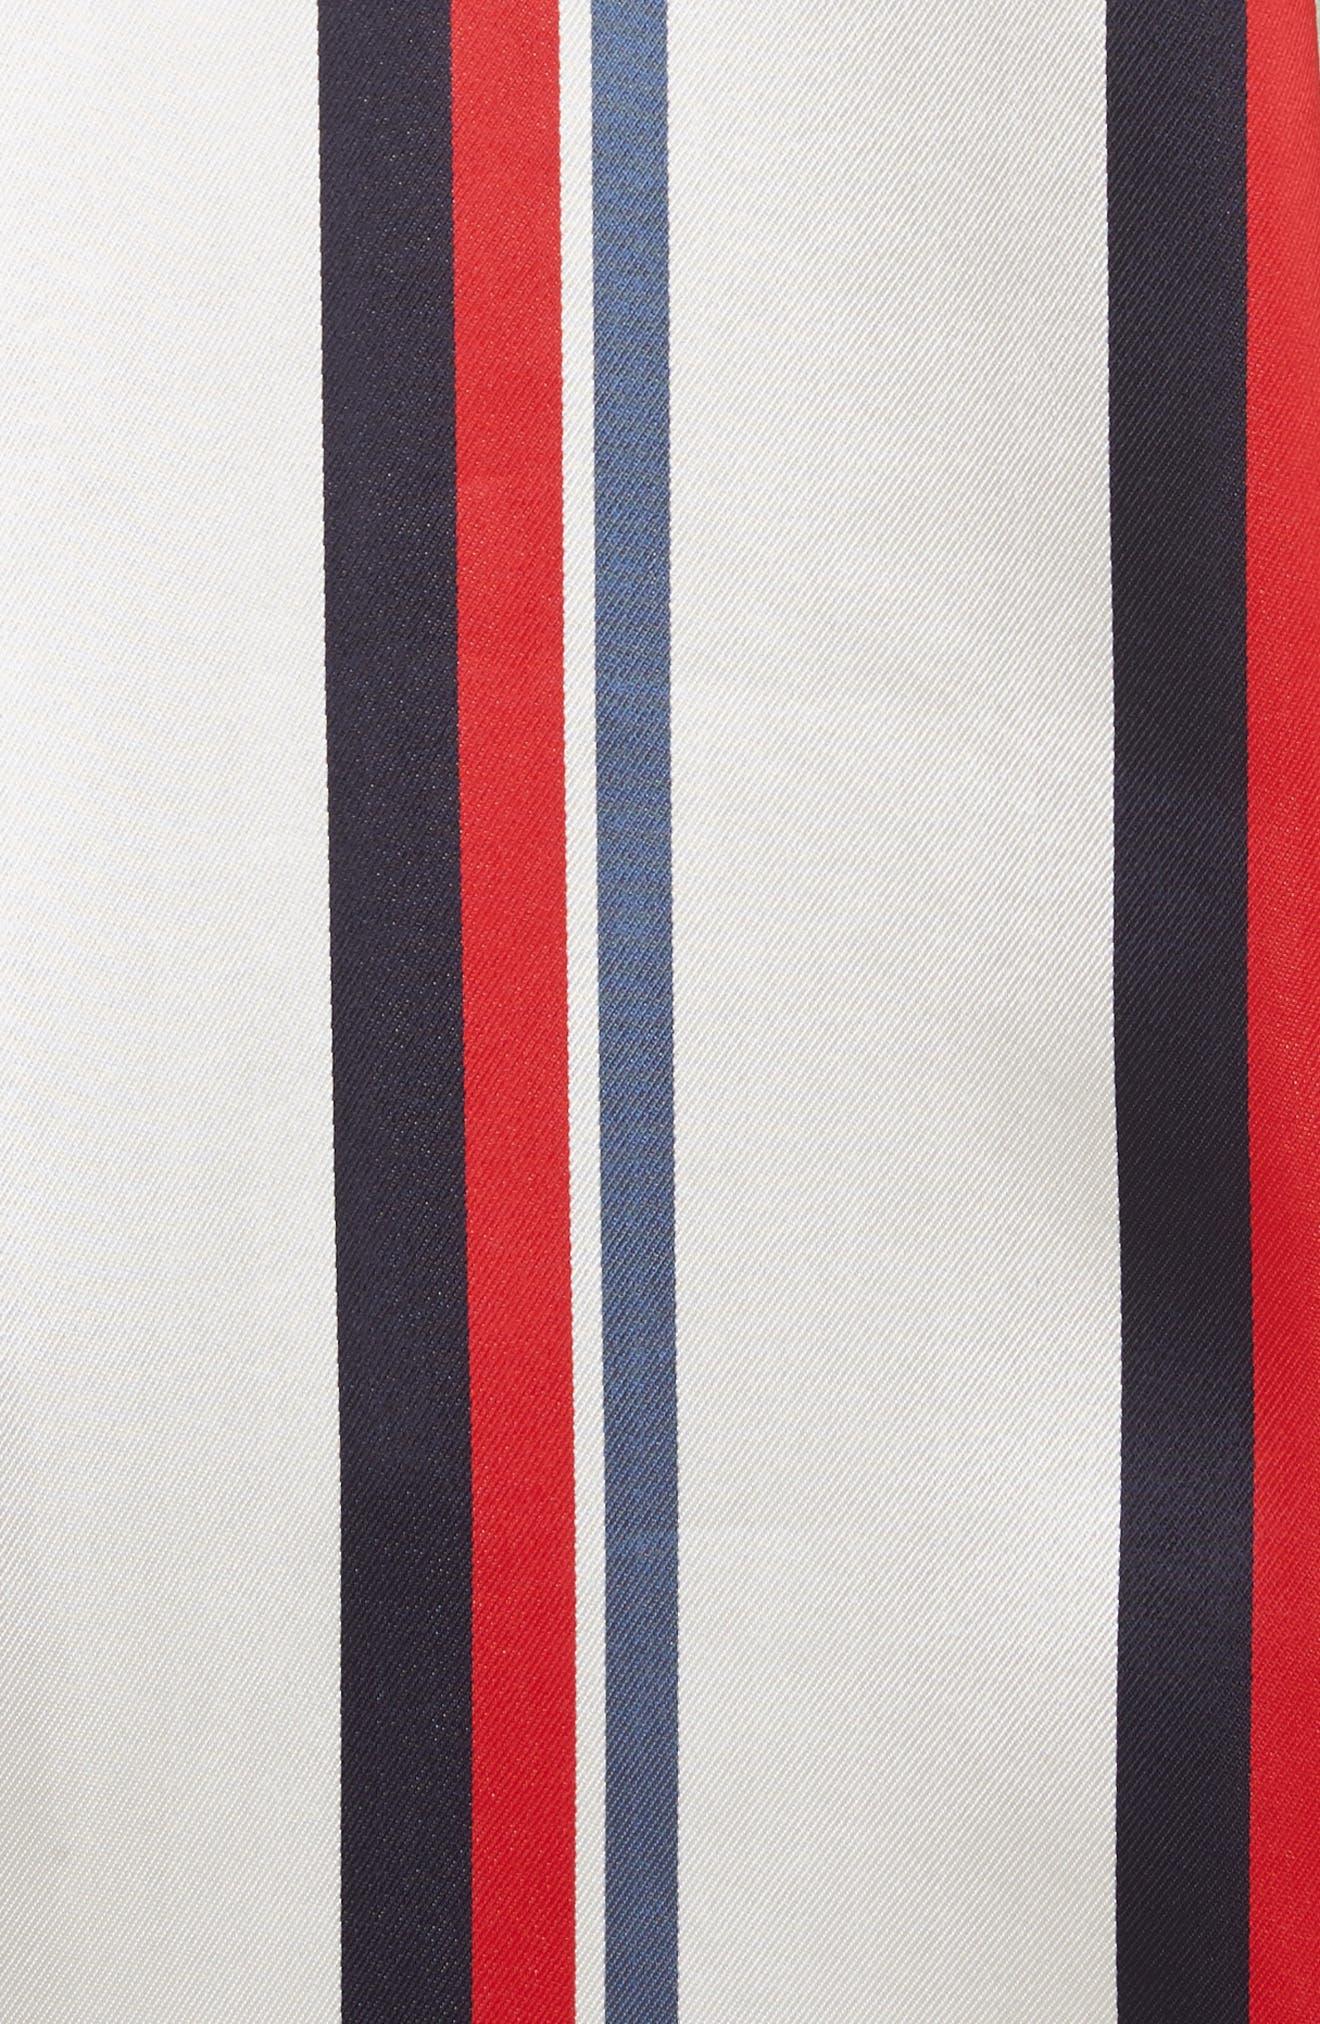 Stripe Off the Shoulder Blouse,                             Alternate thumbnail 5, color,